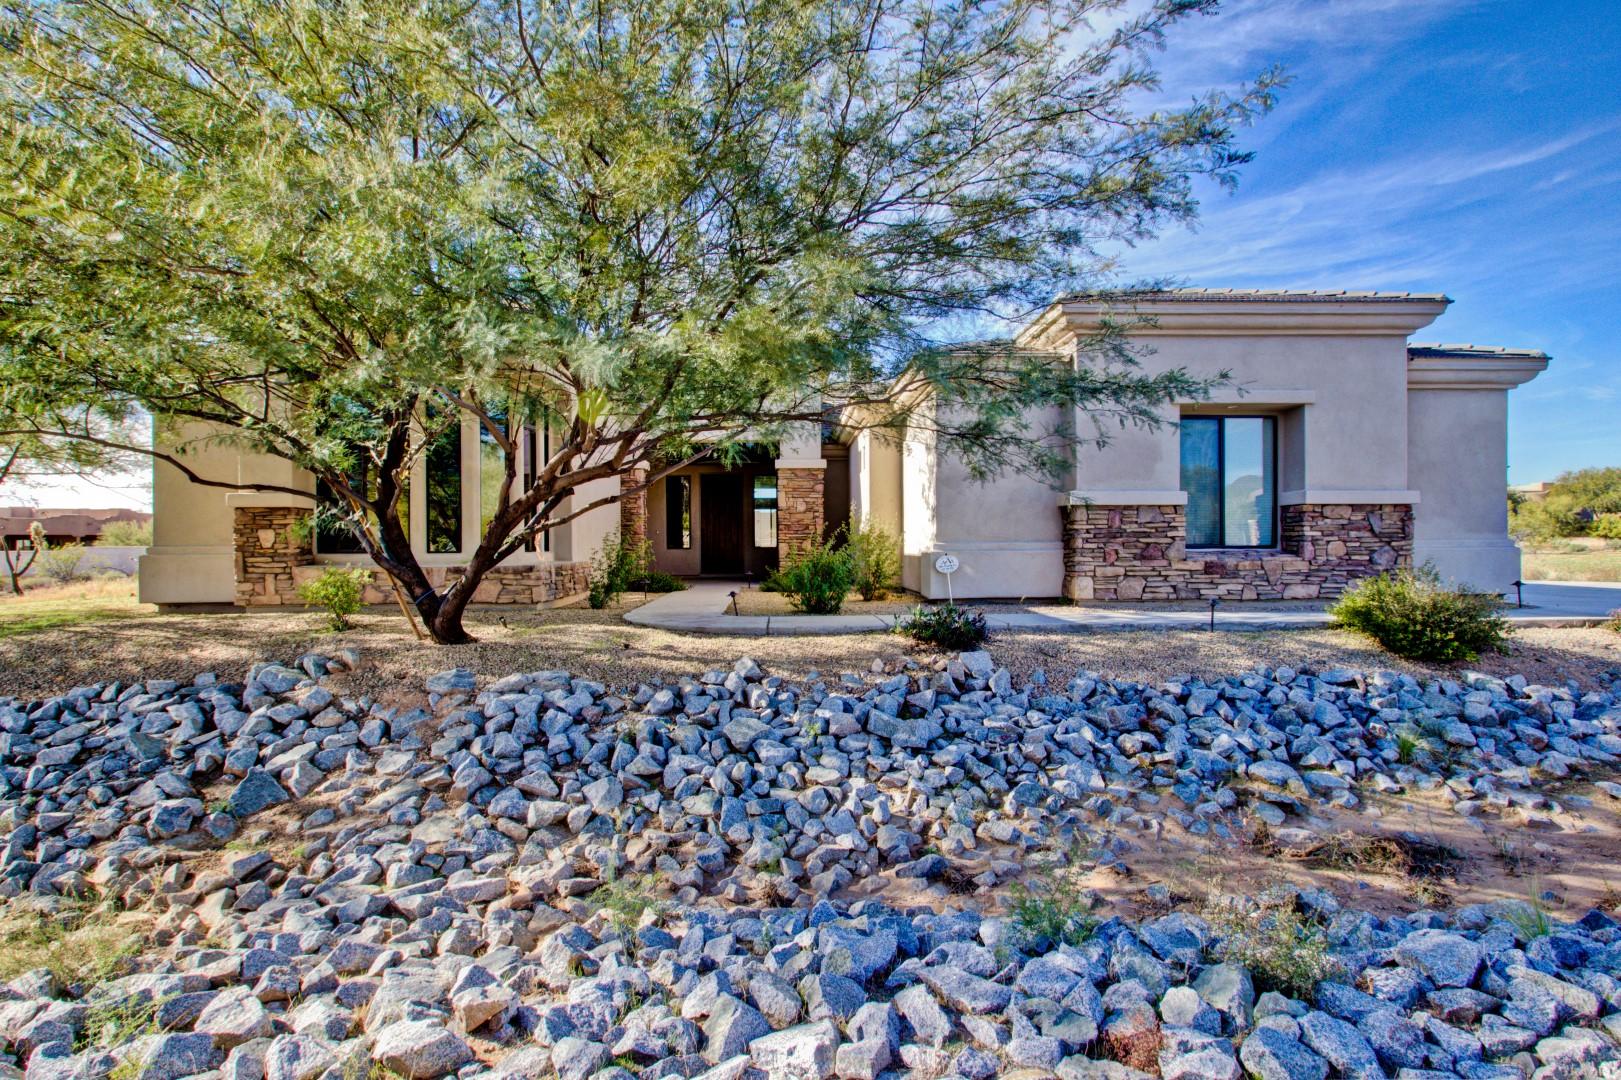 44 E IRVINE RD, Phoenix, AZ 85086